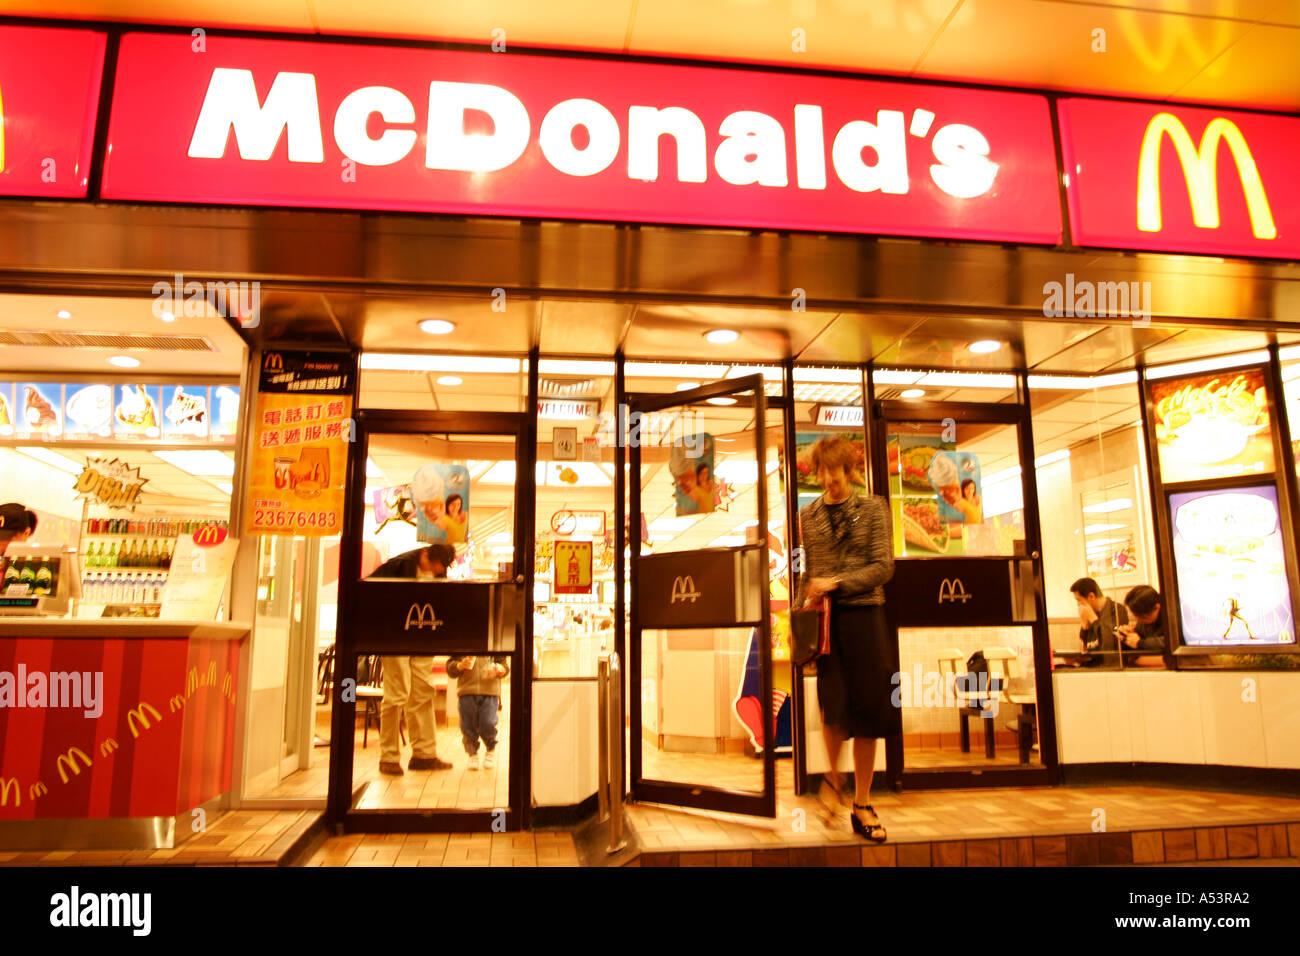 mcdonalds hamburger fast food restaurant in hong kong china stock photo 3652513 alamy. Black Bedroom Furniture Sets. Home Design Ideas